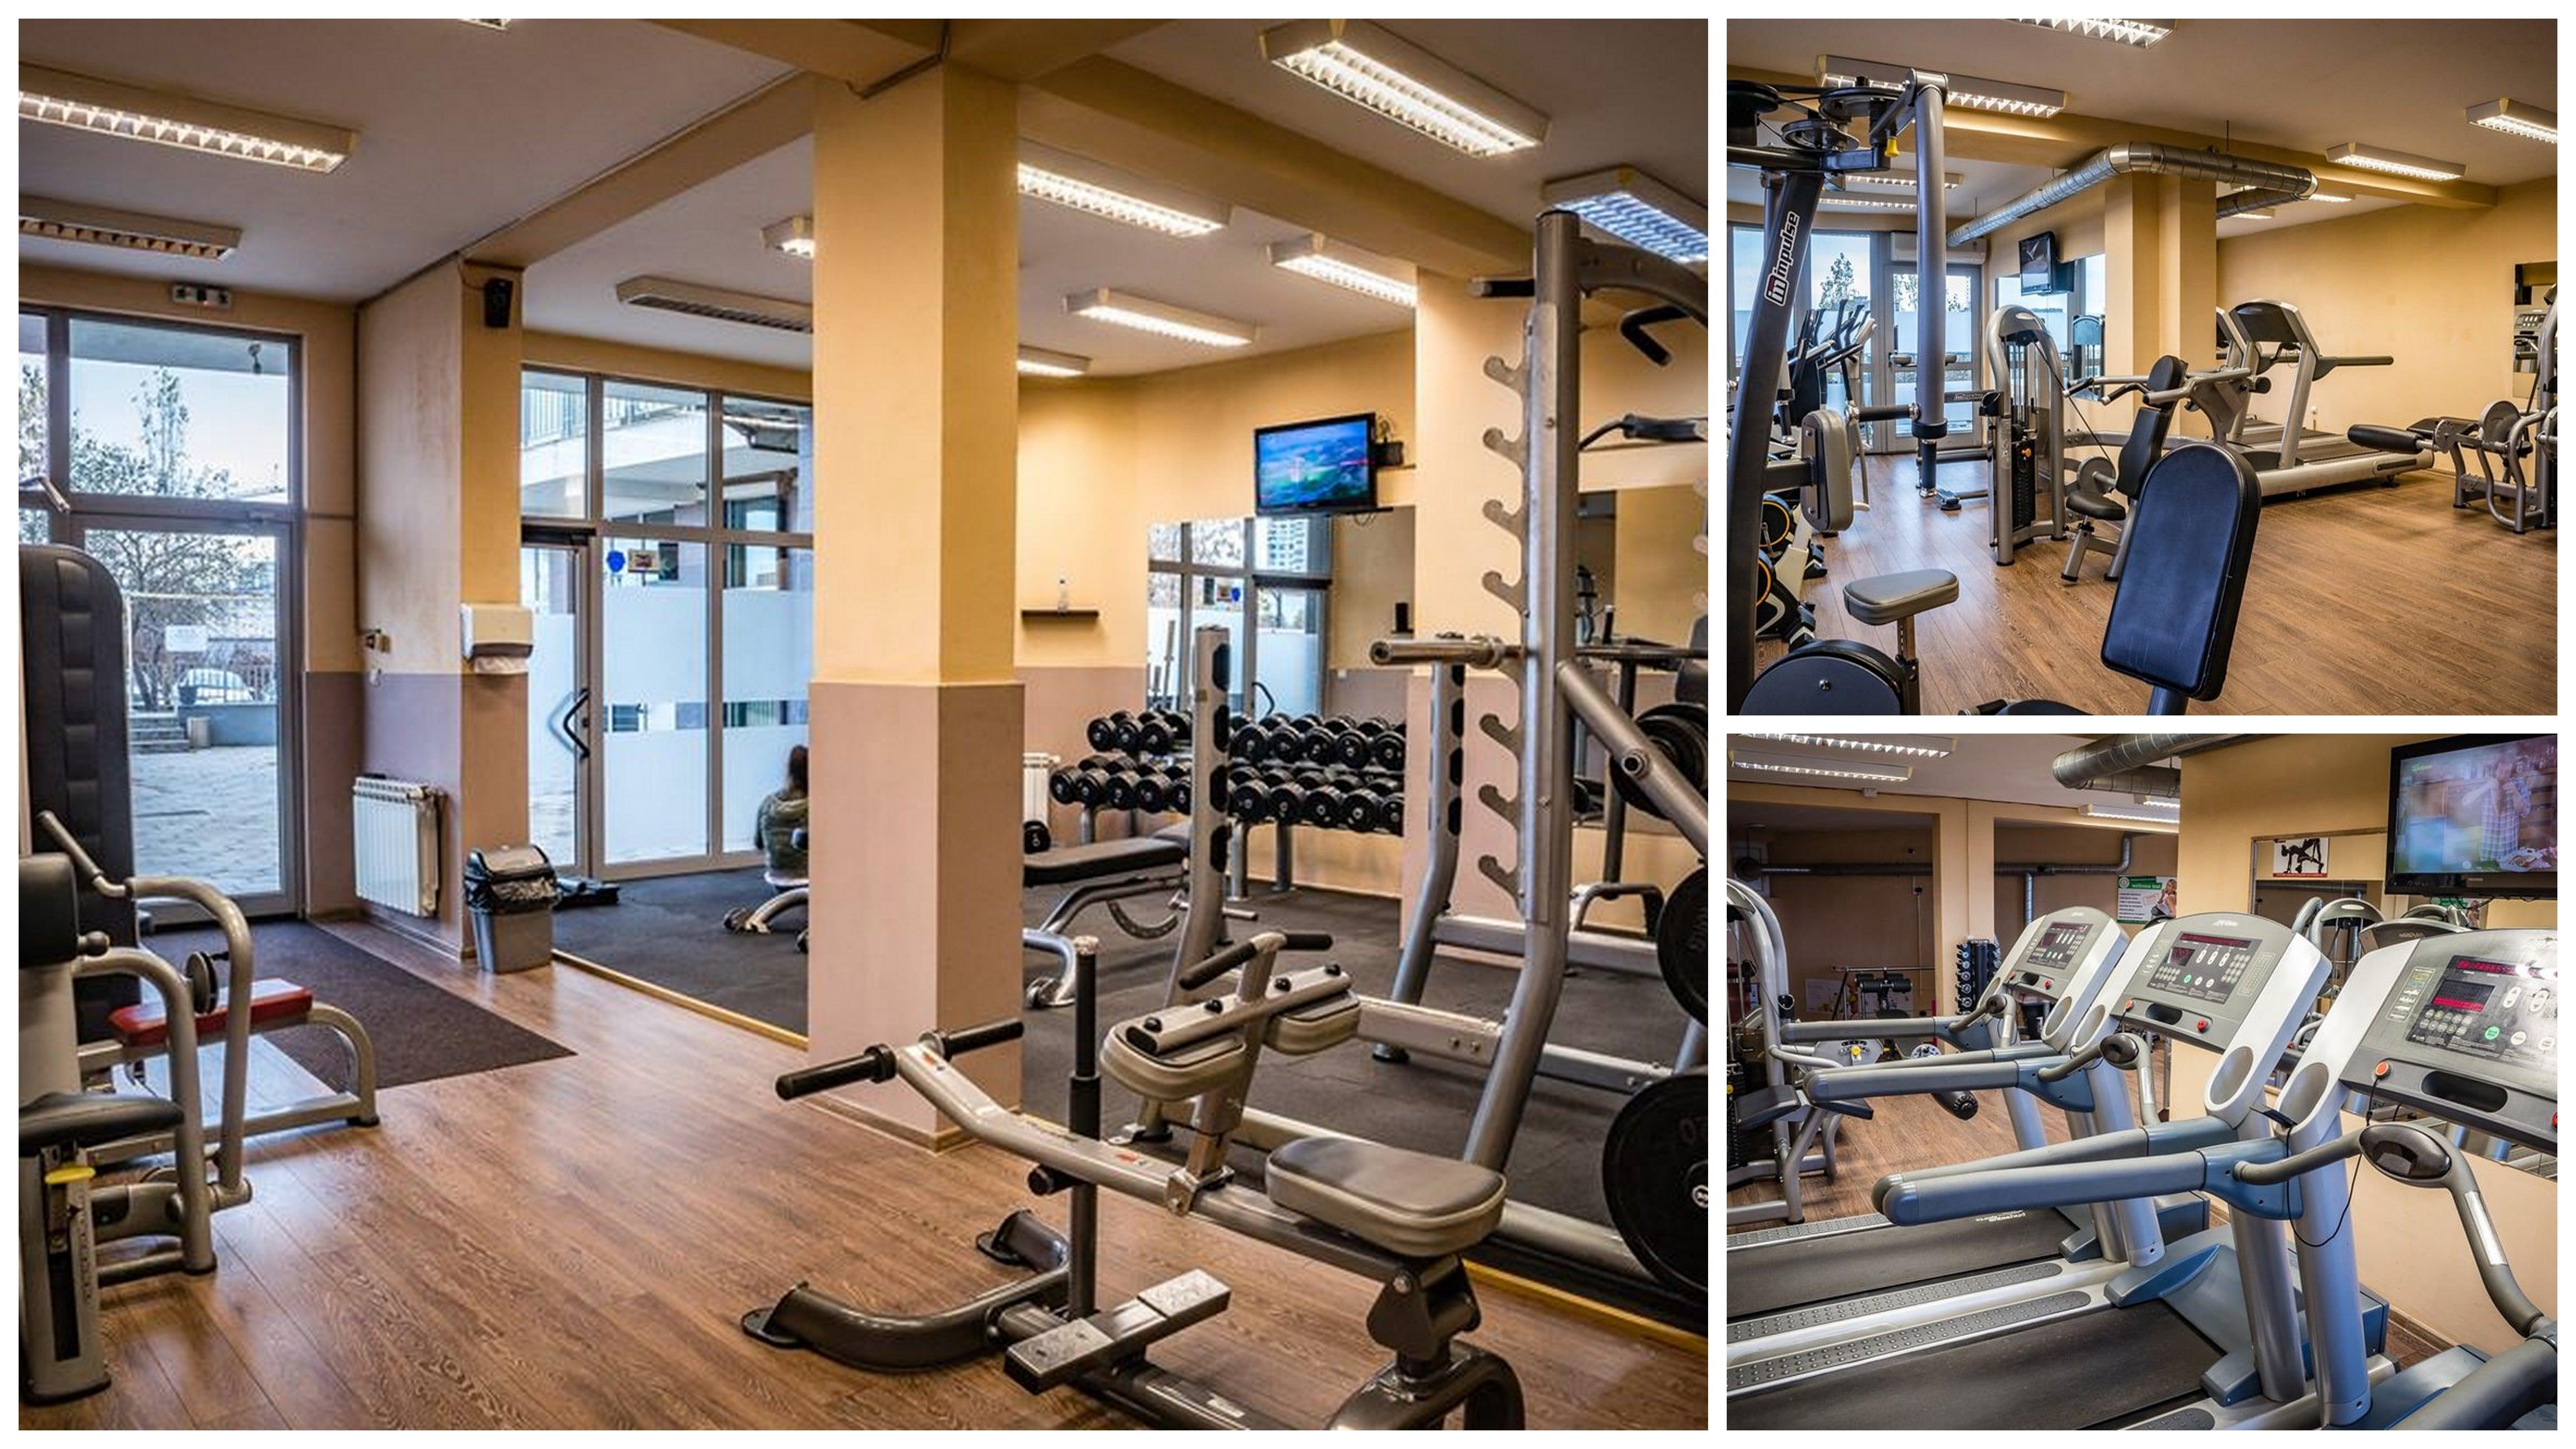 Фитнес център Fitnessplace, гр. София